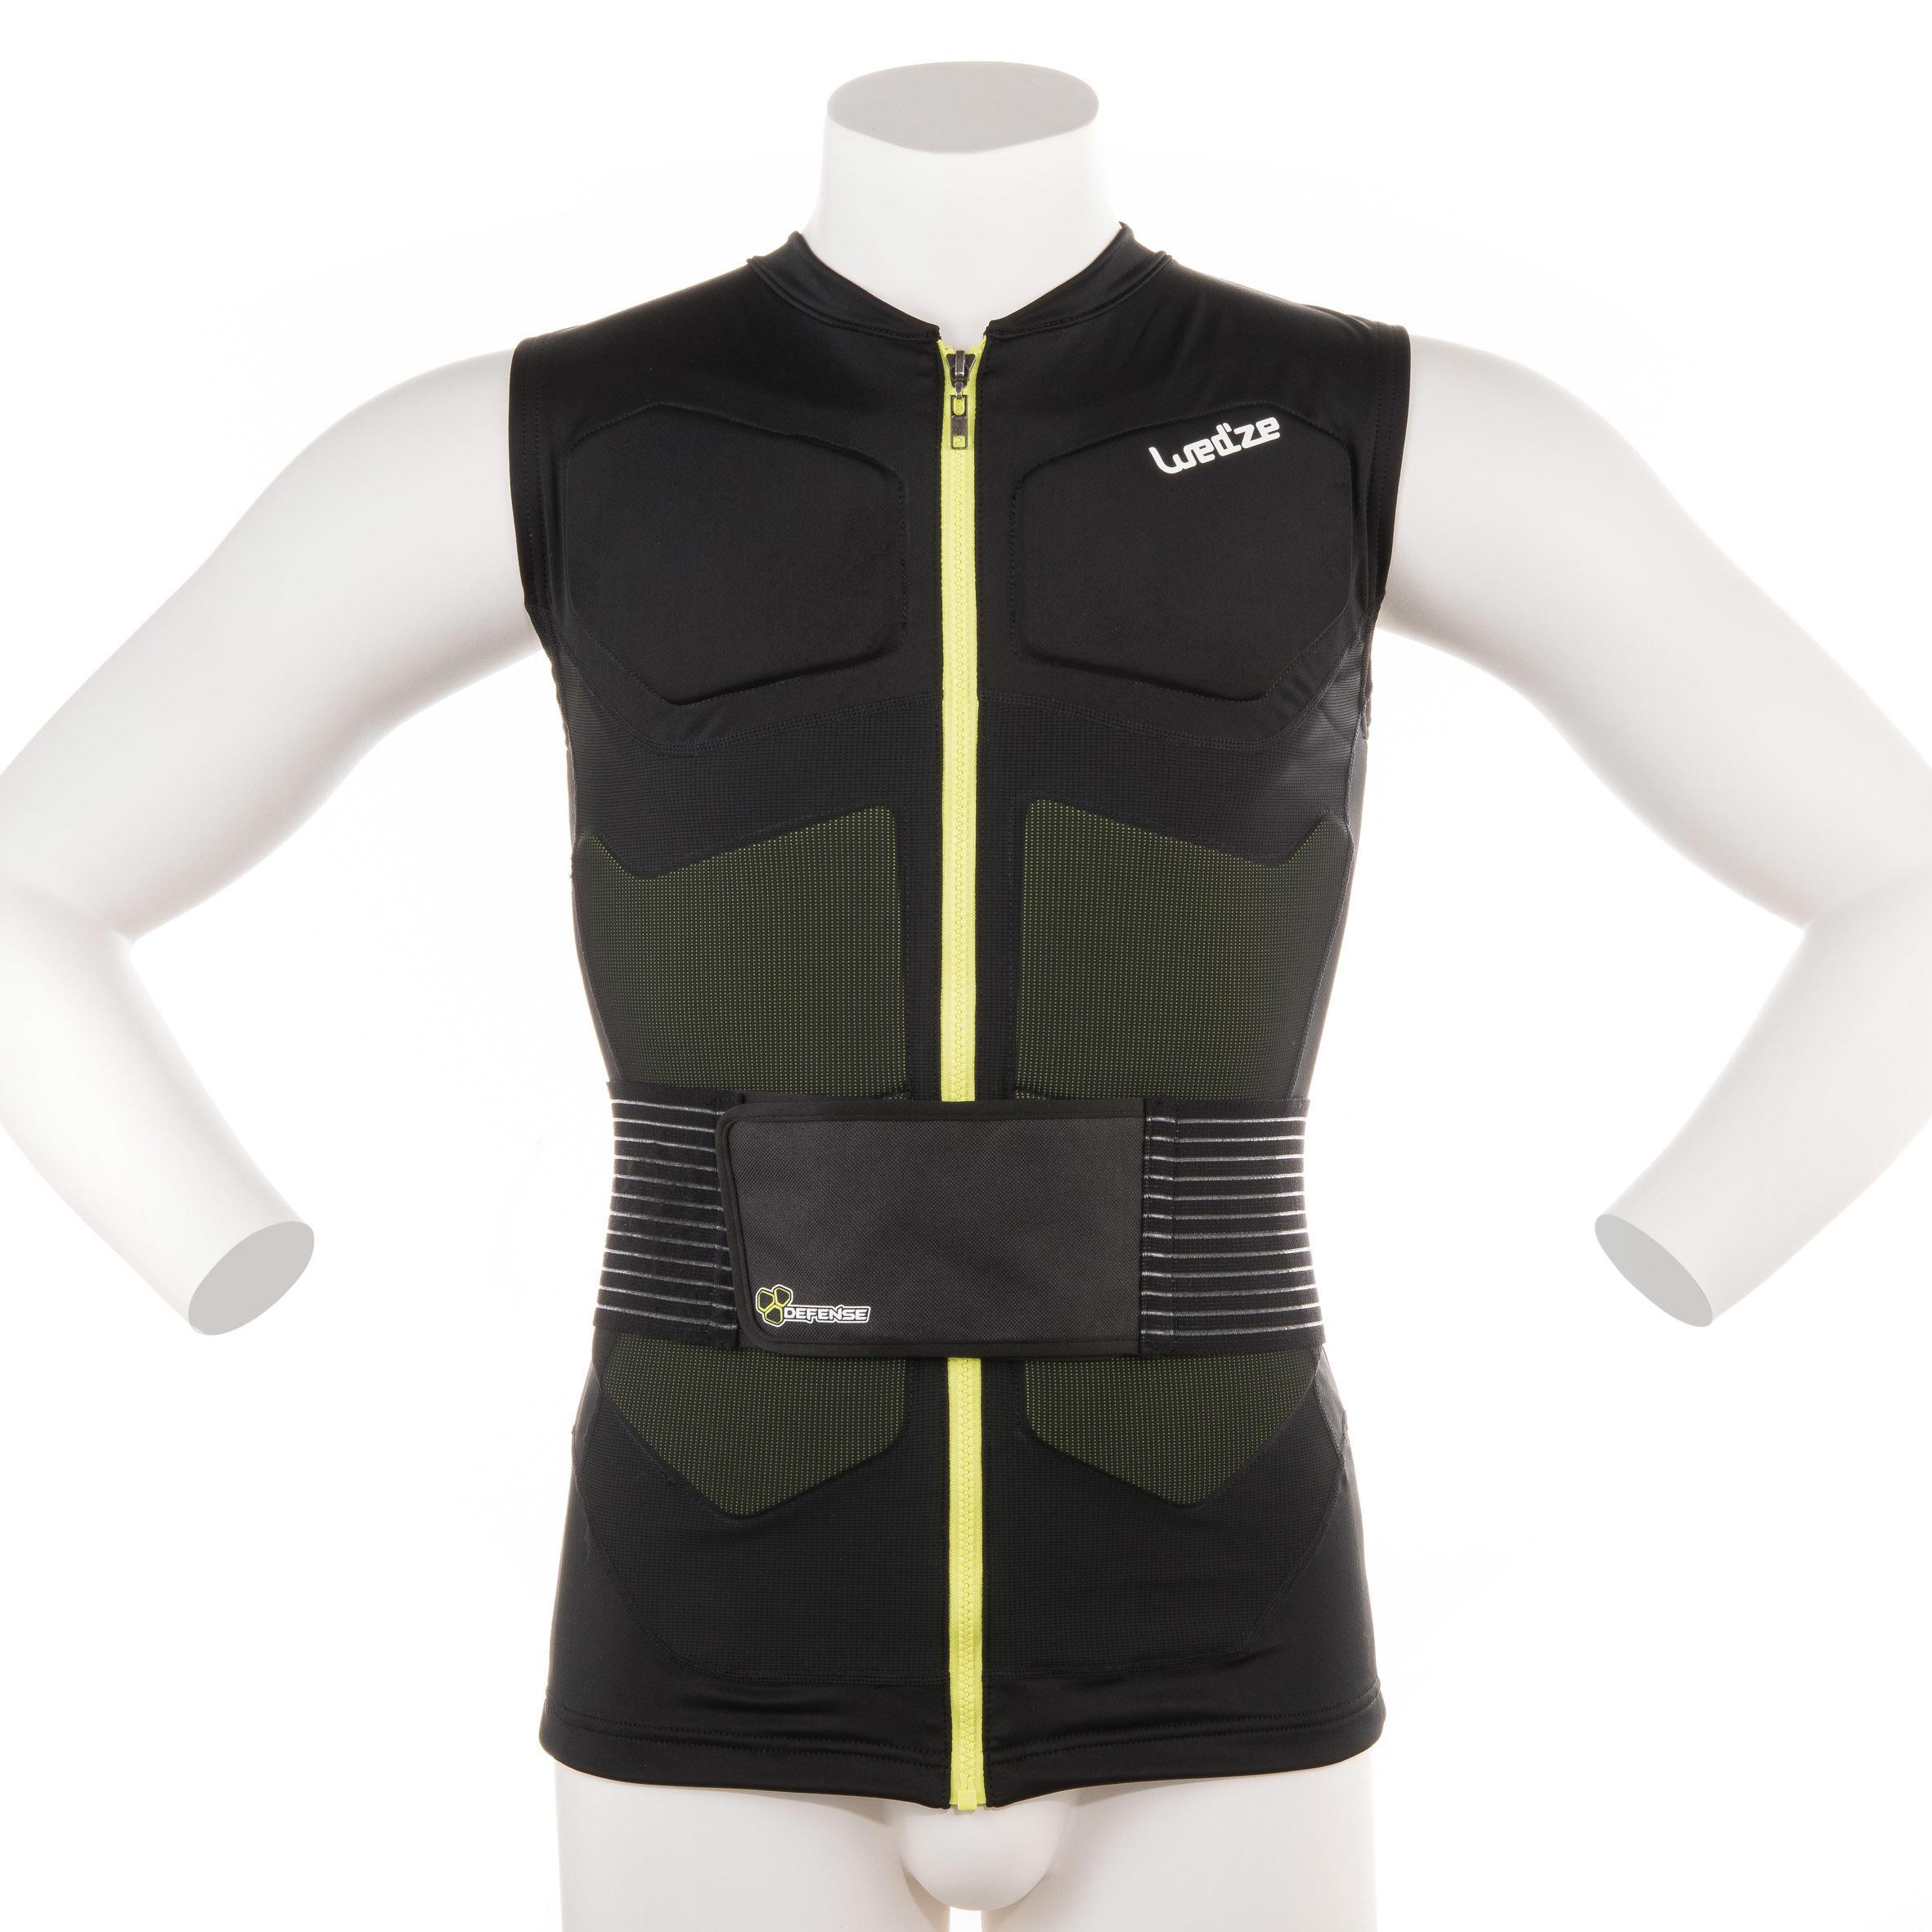 Gilet de protection ski et snowboard adulte defense jacket